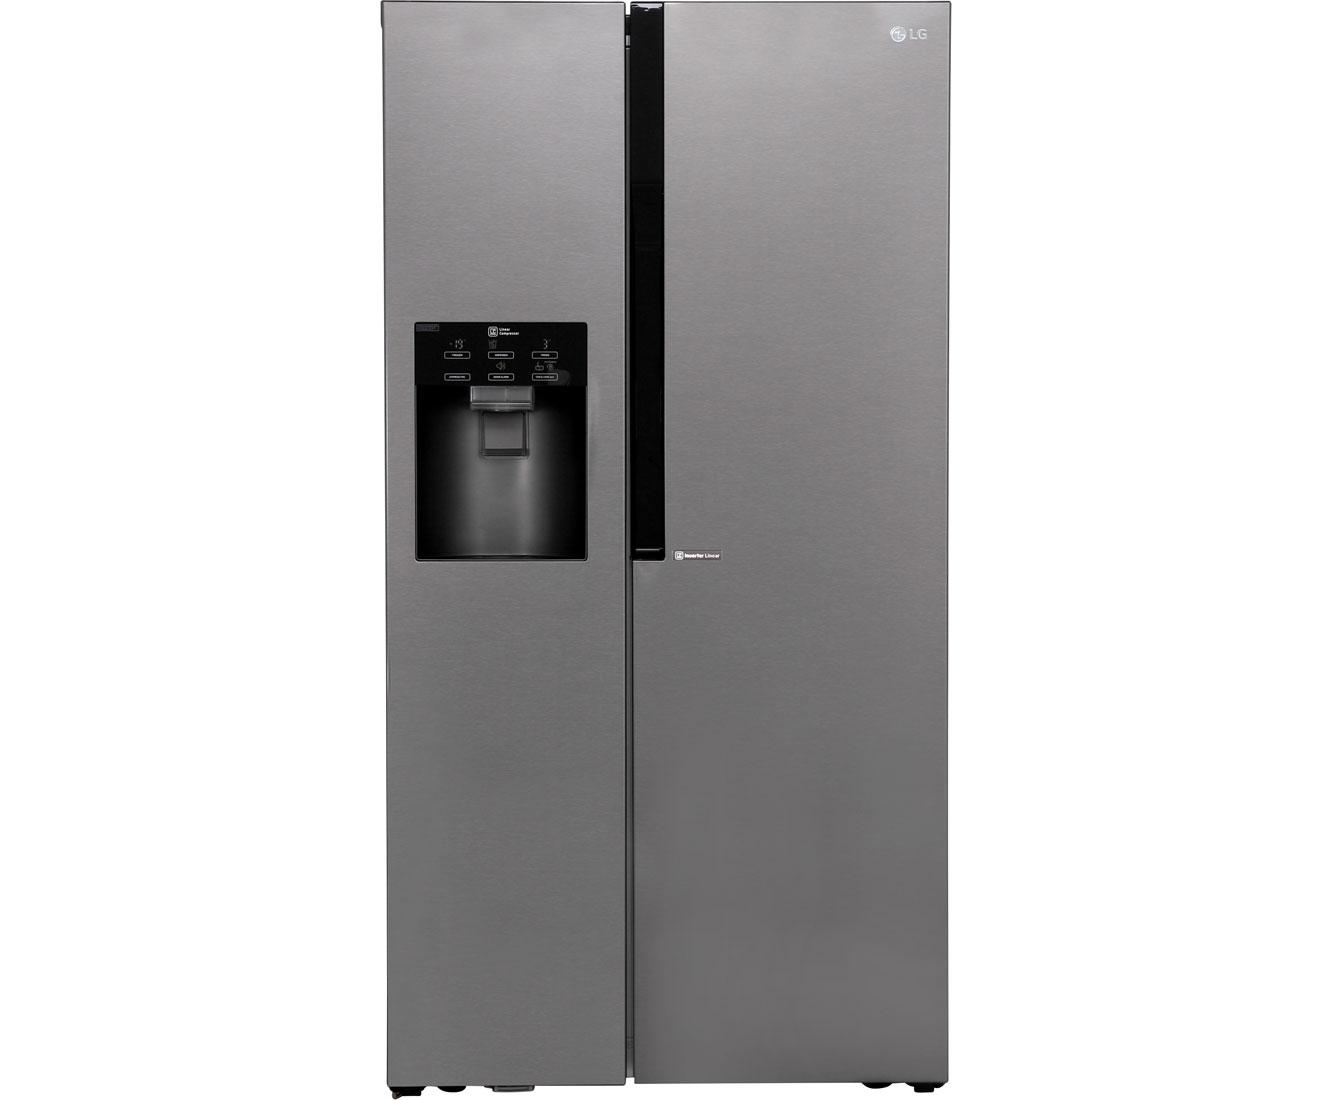 Side By Side Kühlschrank Günstig Kaufen : Side by side kühlschrank preisvergleich u die besten angebote